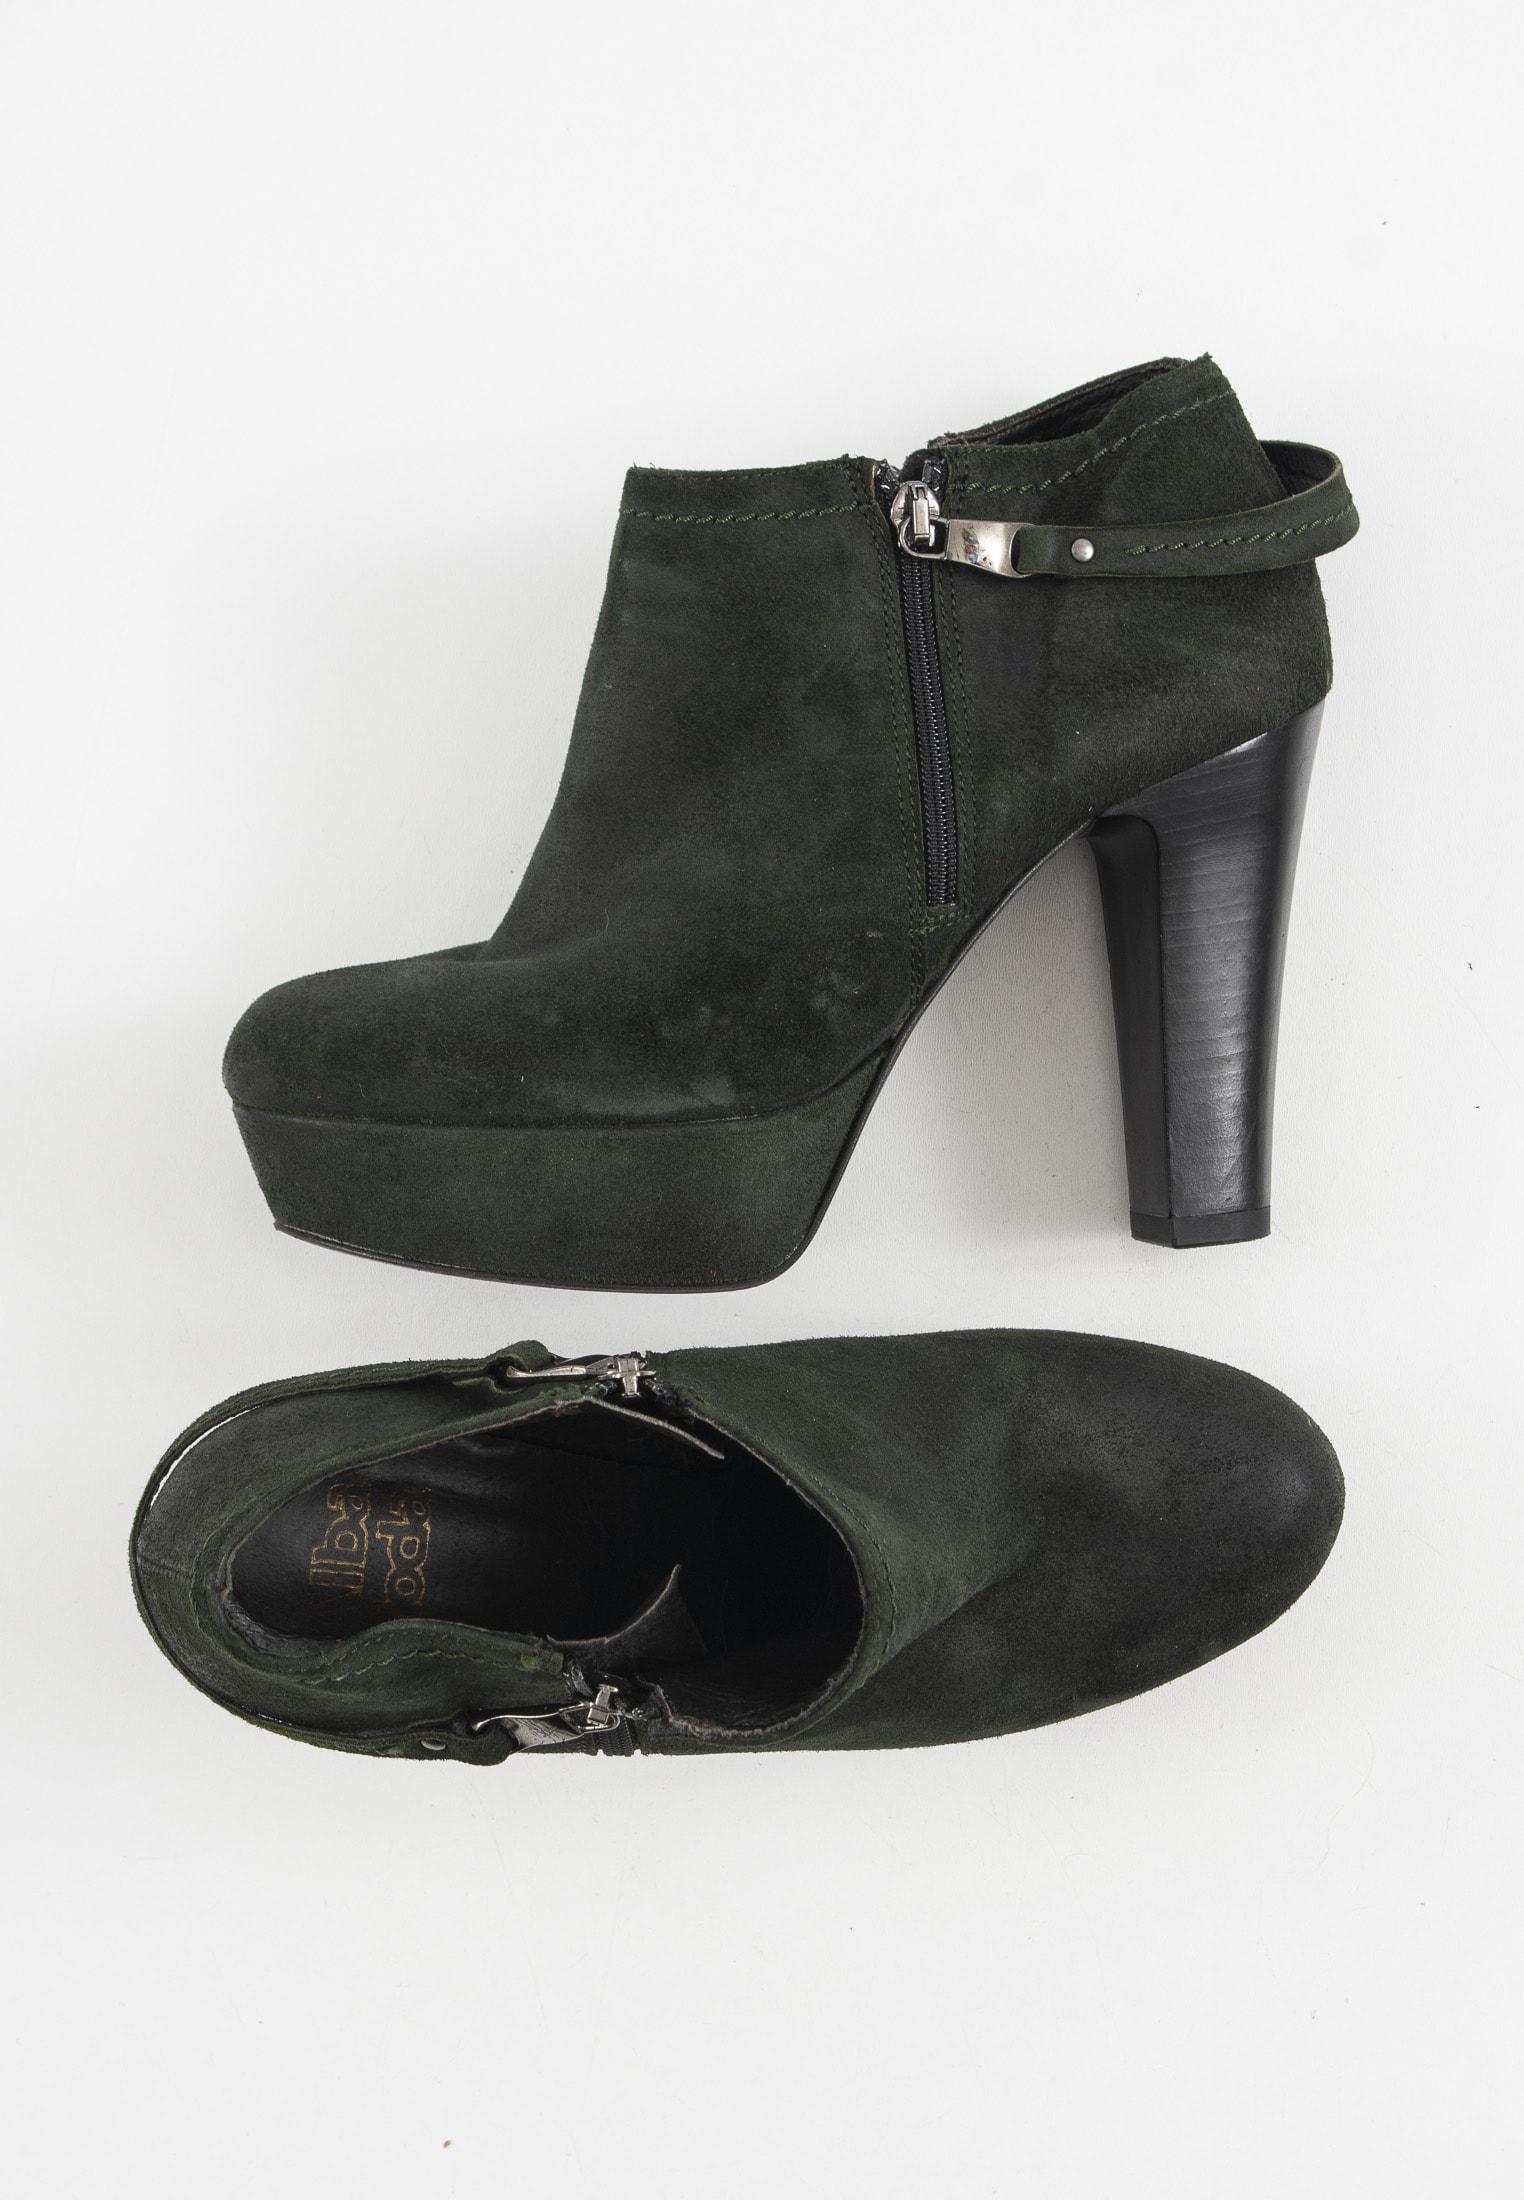 Alba Moda Stiefel / Stiefelette / Boots Grün Gr.38